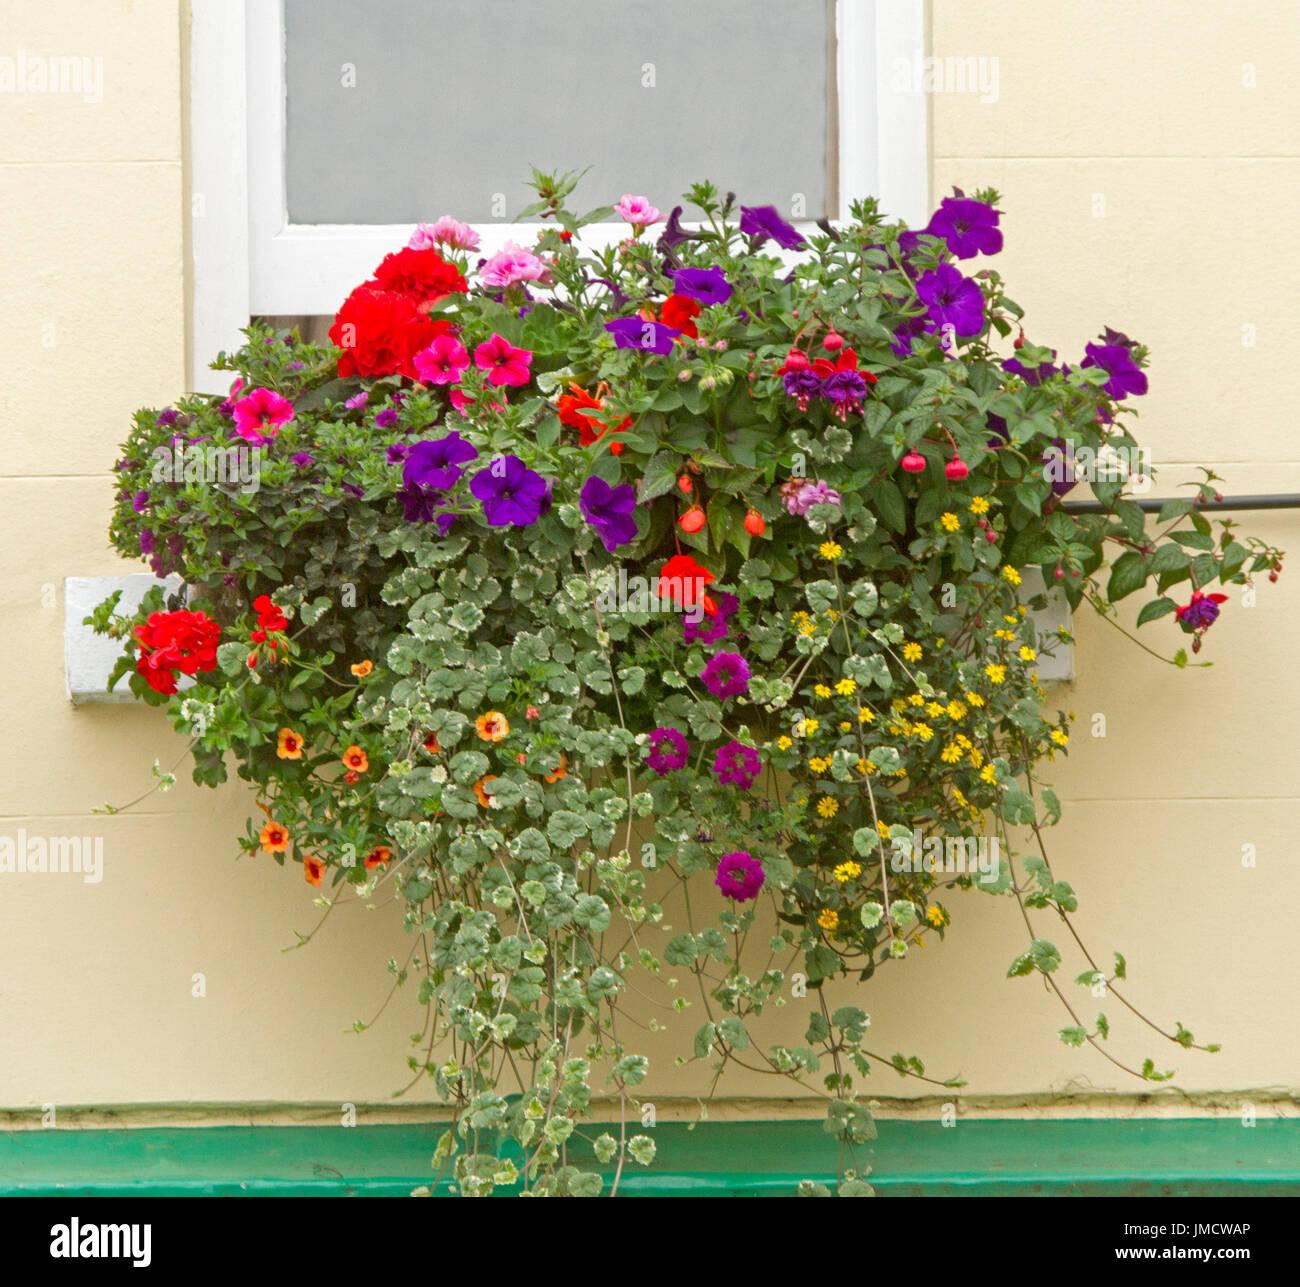 Flowering plants, purple & red petunias, yellow daisies, orange calibrachoas, red fuchsias & geraniums, variegated foliage in window box by cream wall - Stock Image